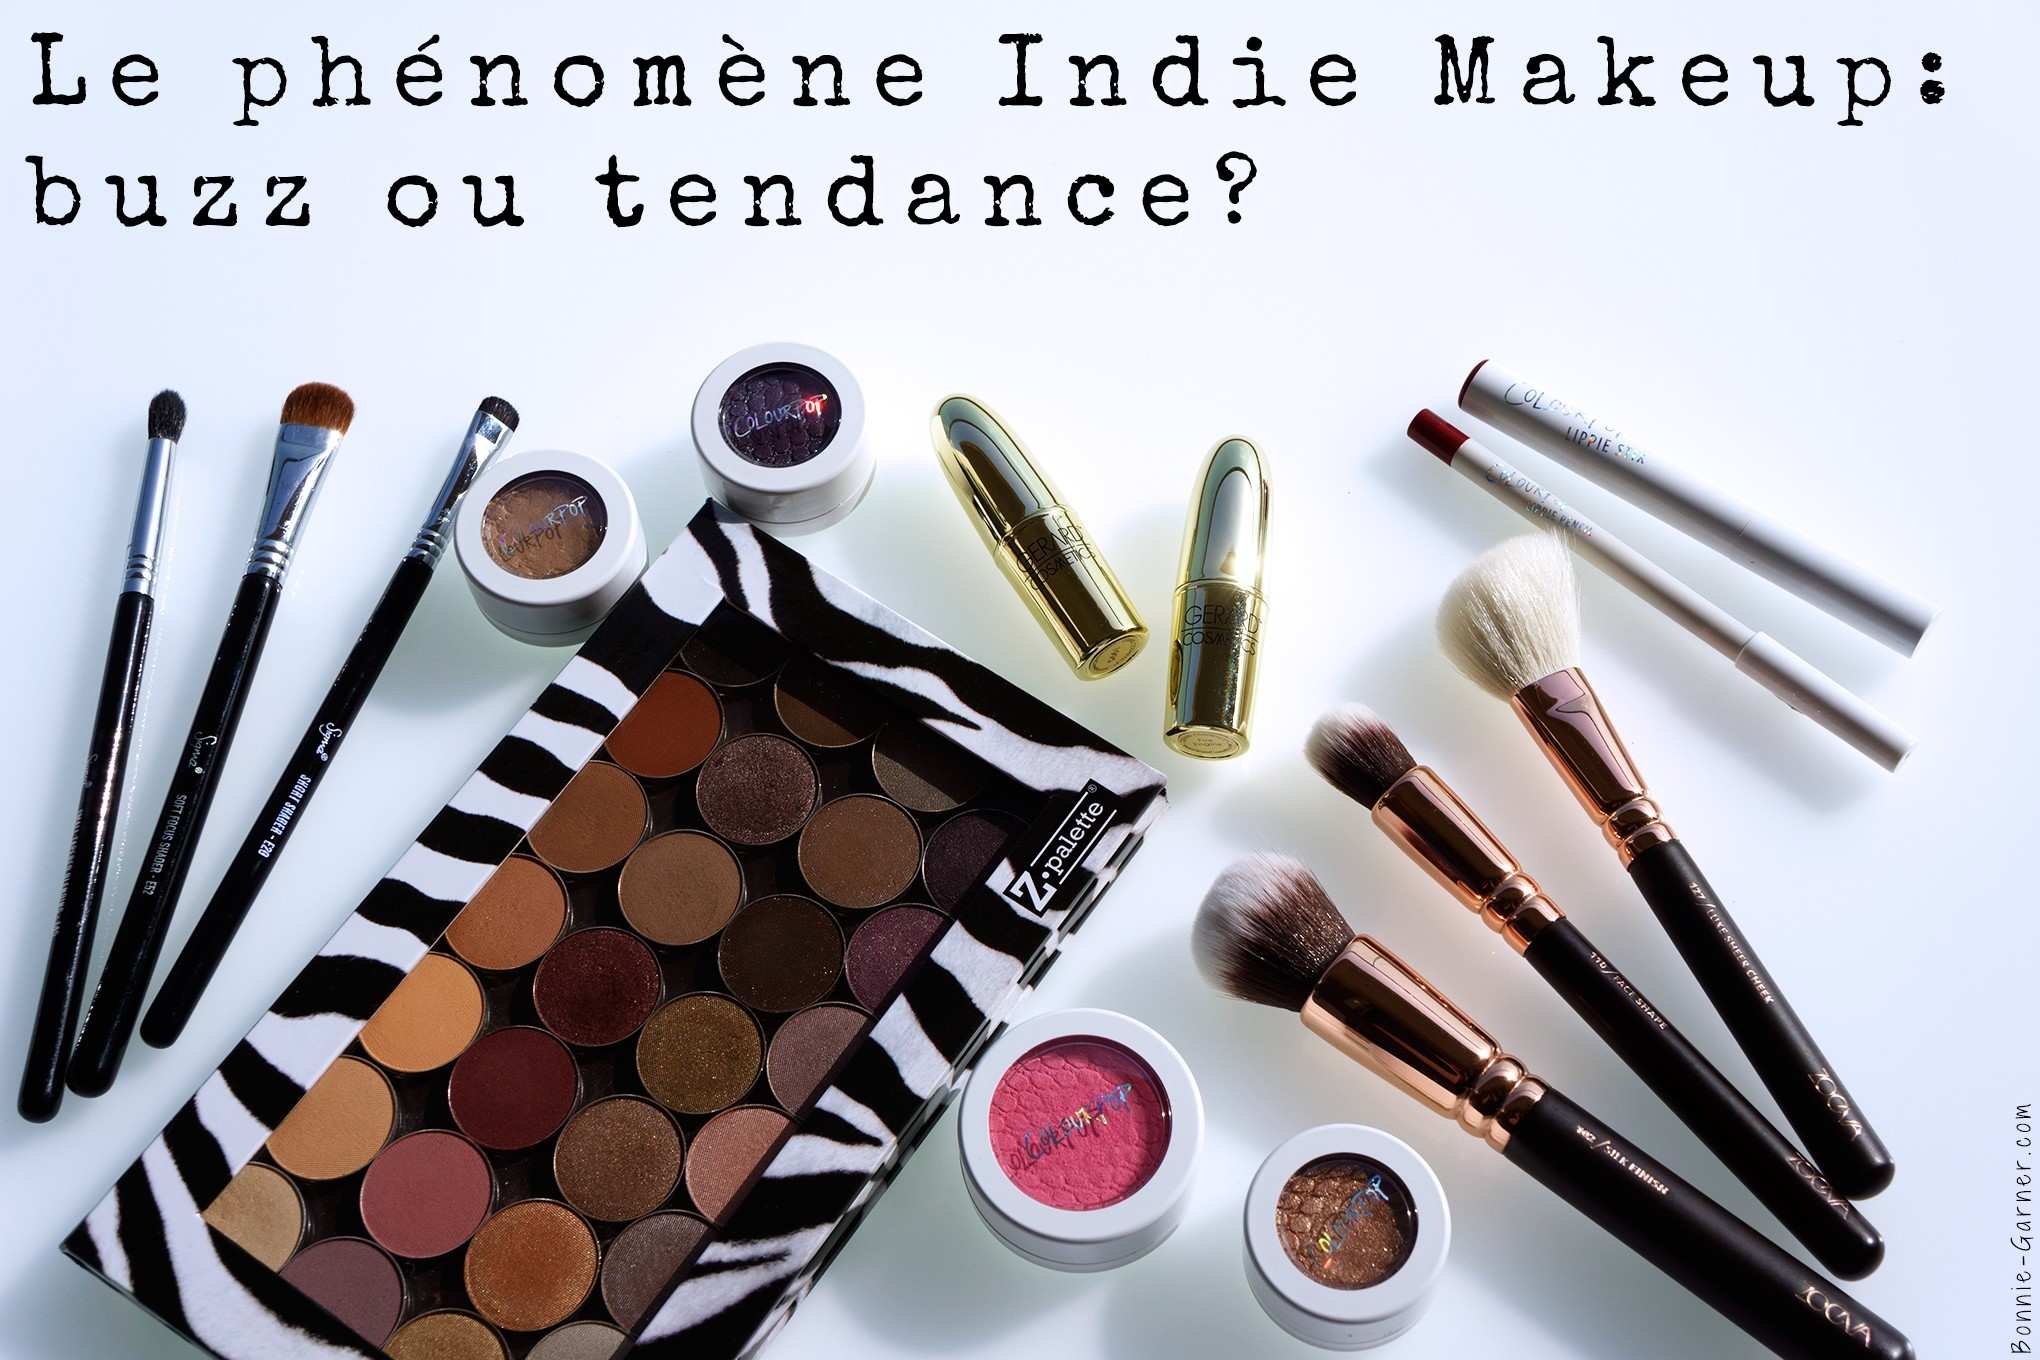 Le phénomène Indie Makeup: buzz ou tendance?